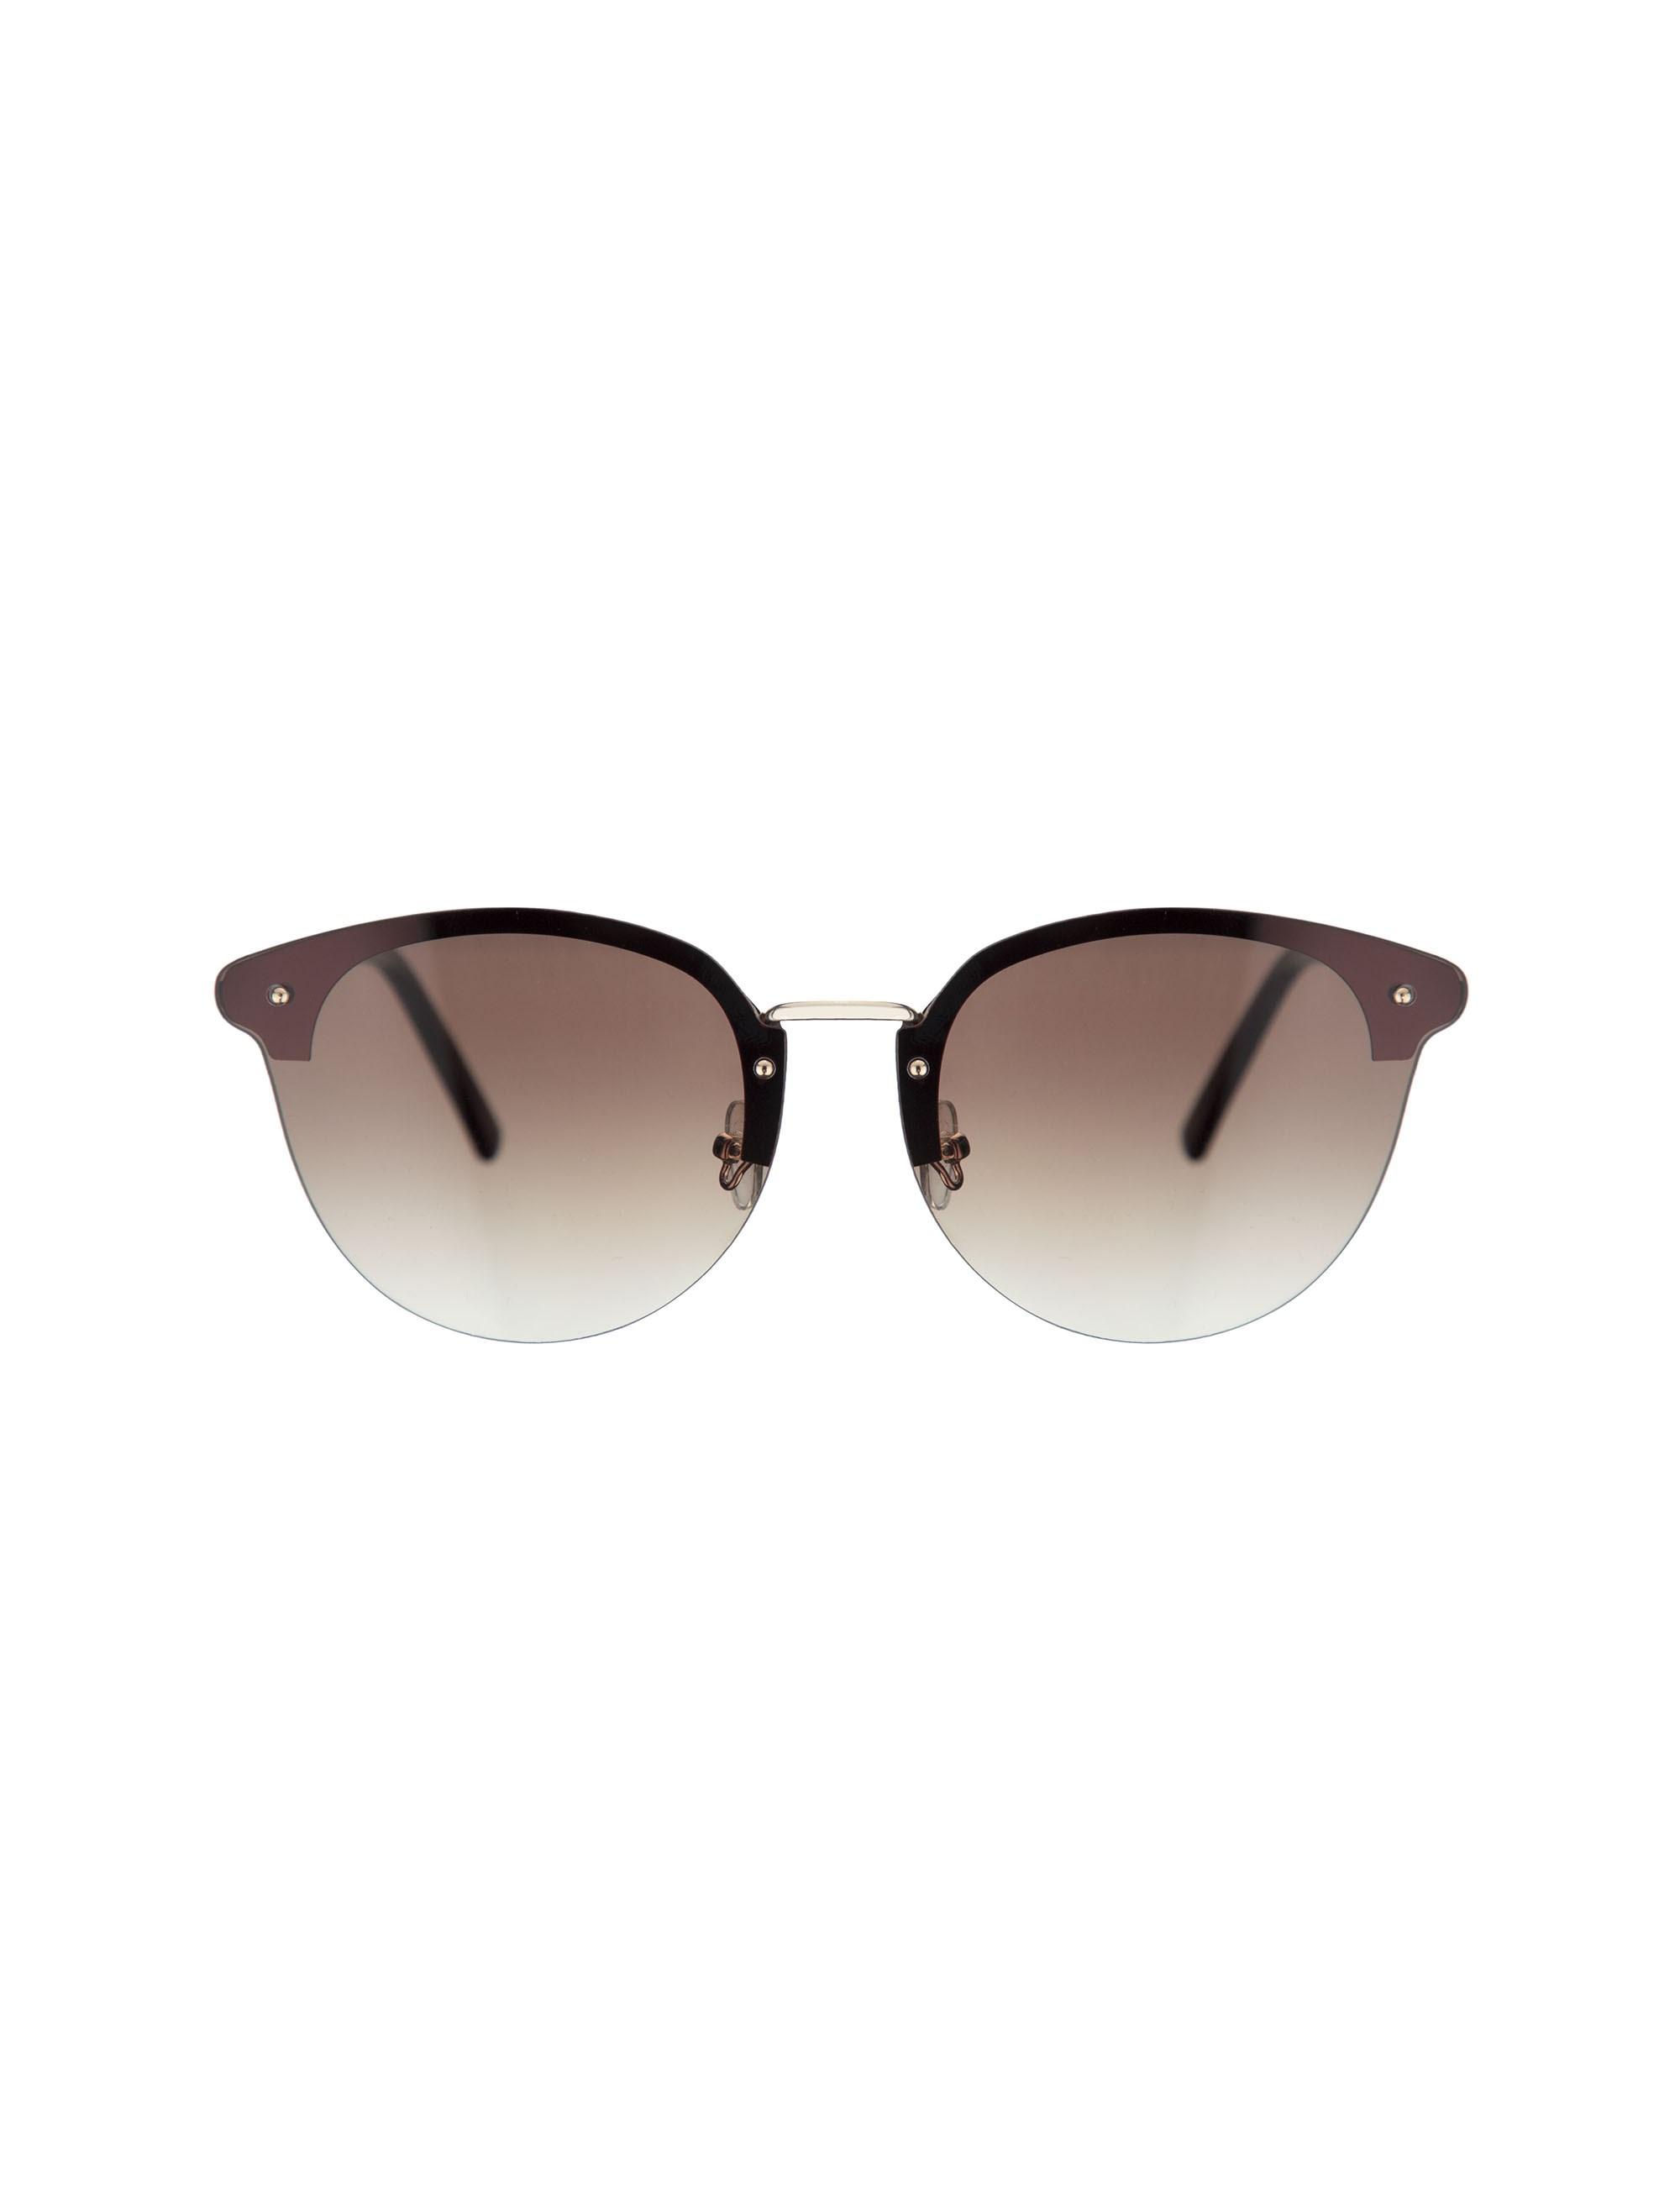 قیمت عینک آفتابی کلاب مستر زنانه - مانگو